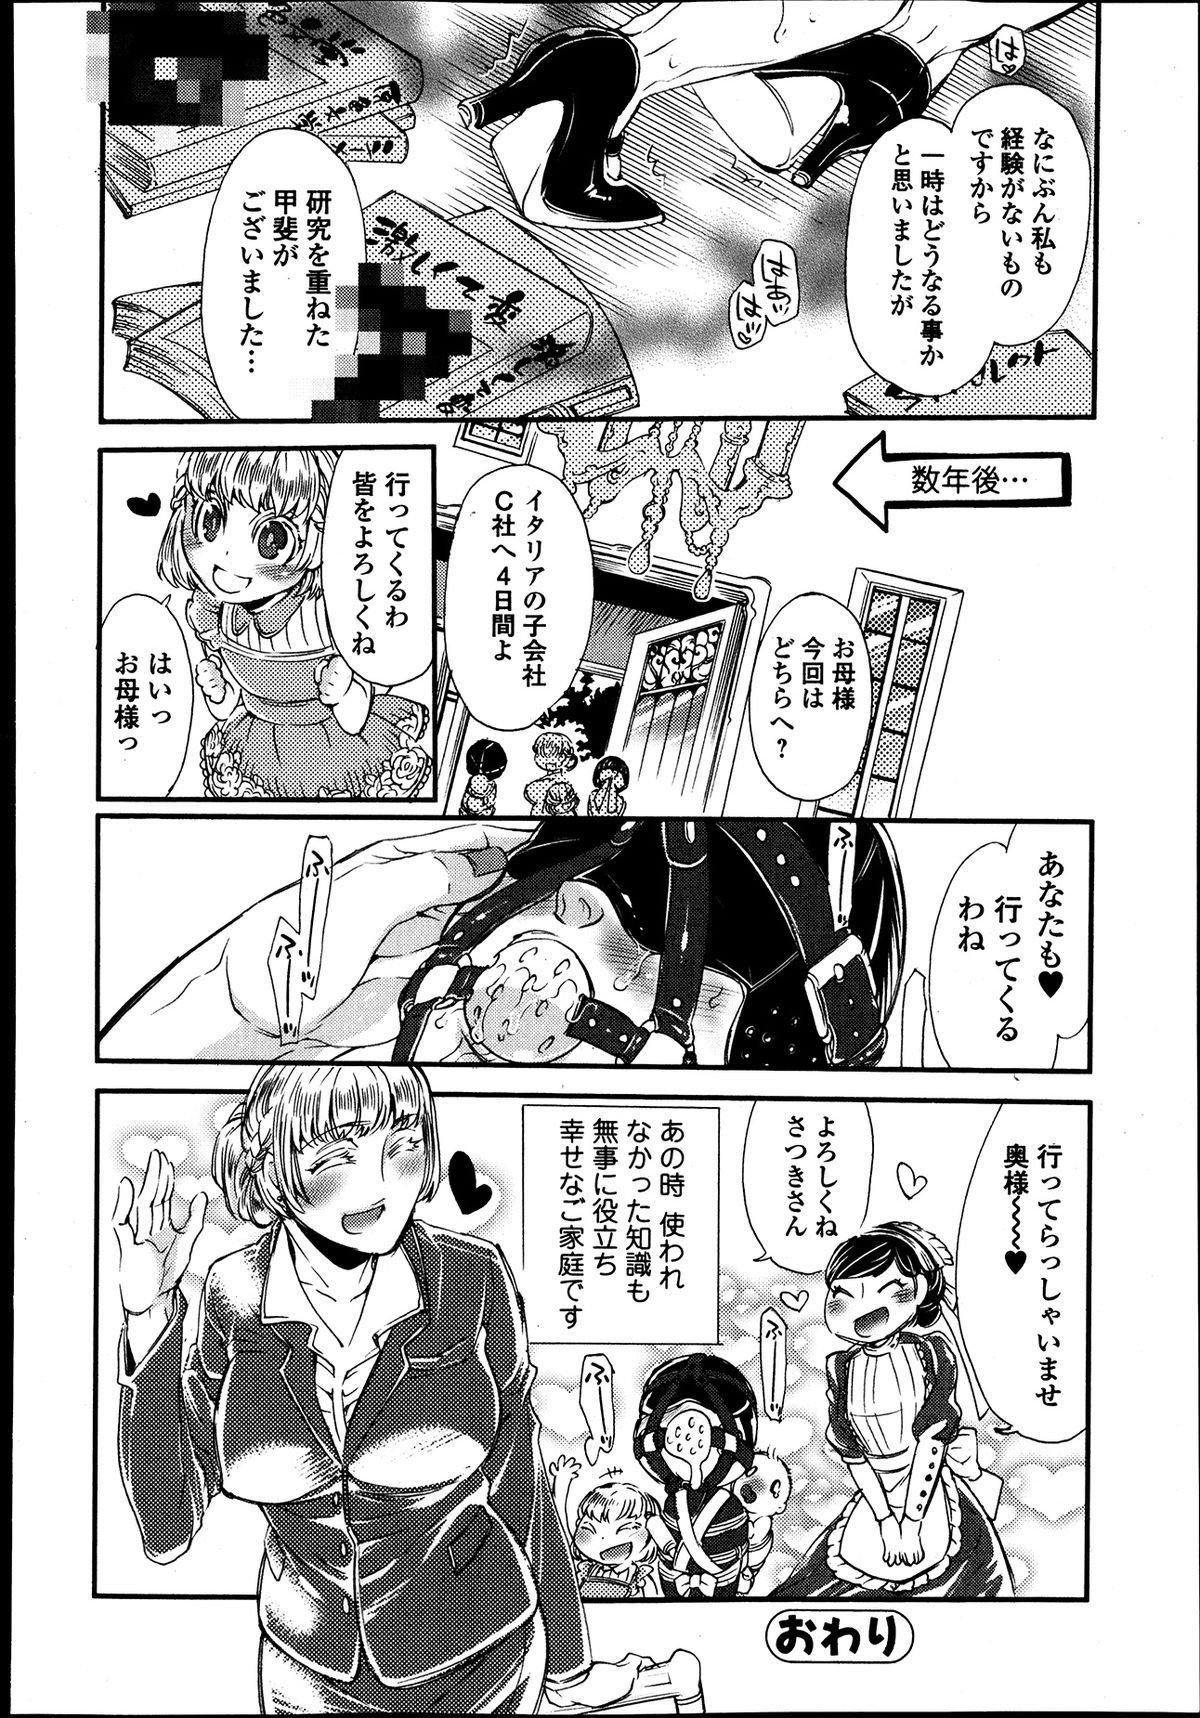 Bishoujo Kakumei KIWAME Road Vol.9 207